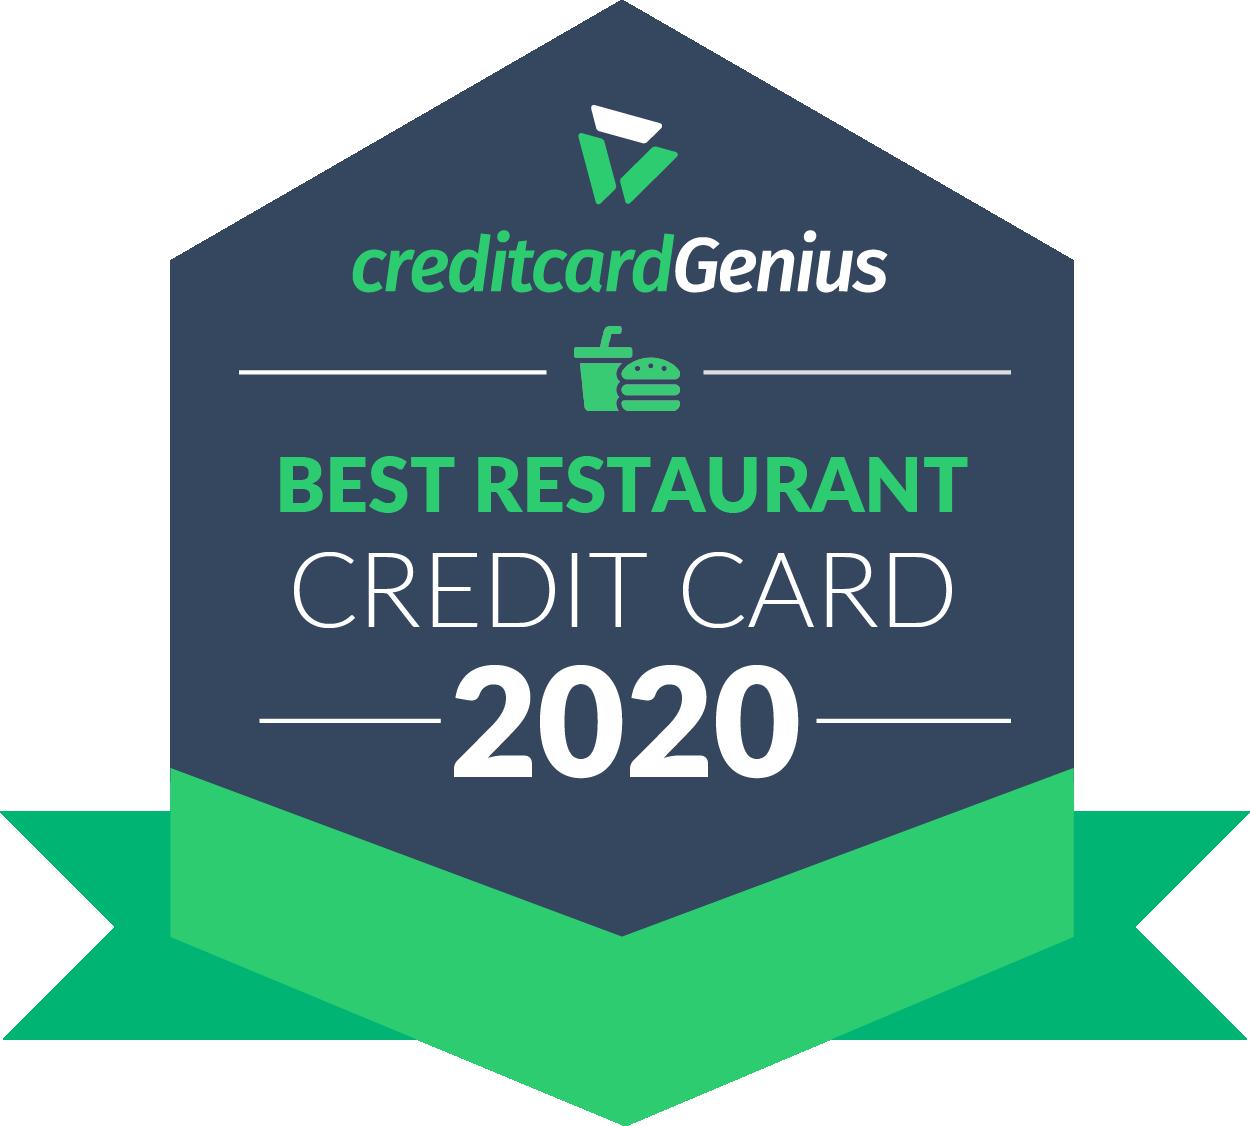 Best restaurant credit card for 2020 award seal